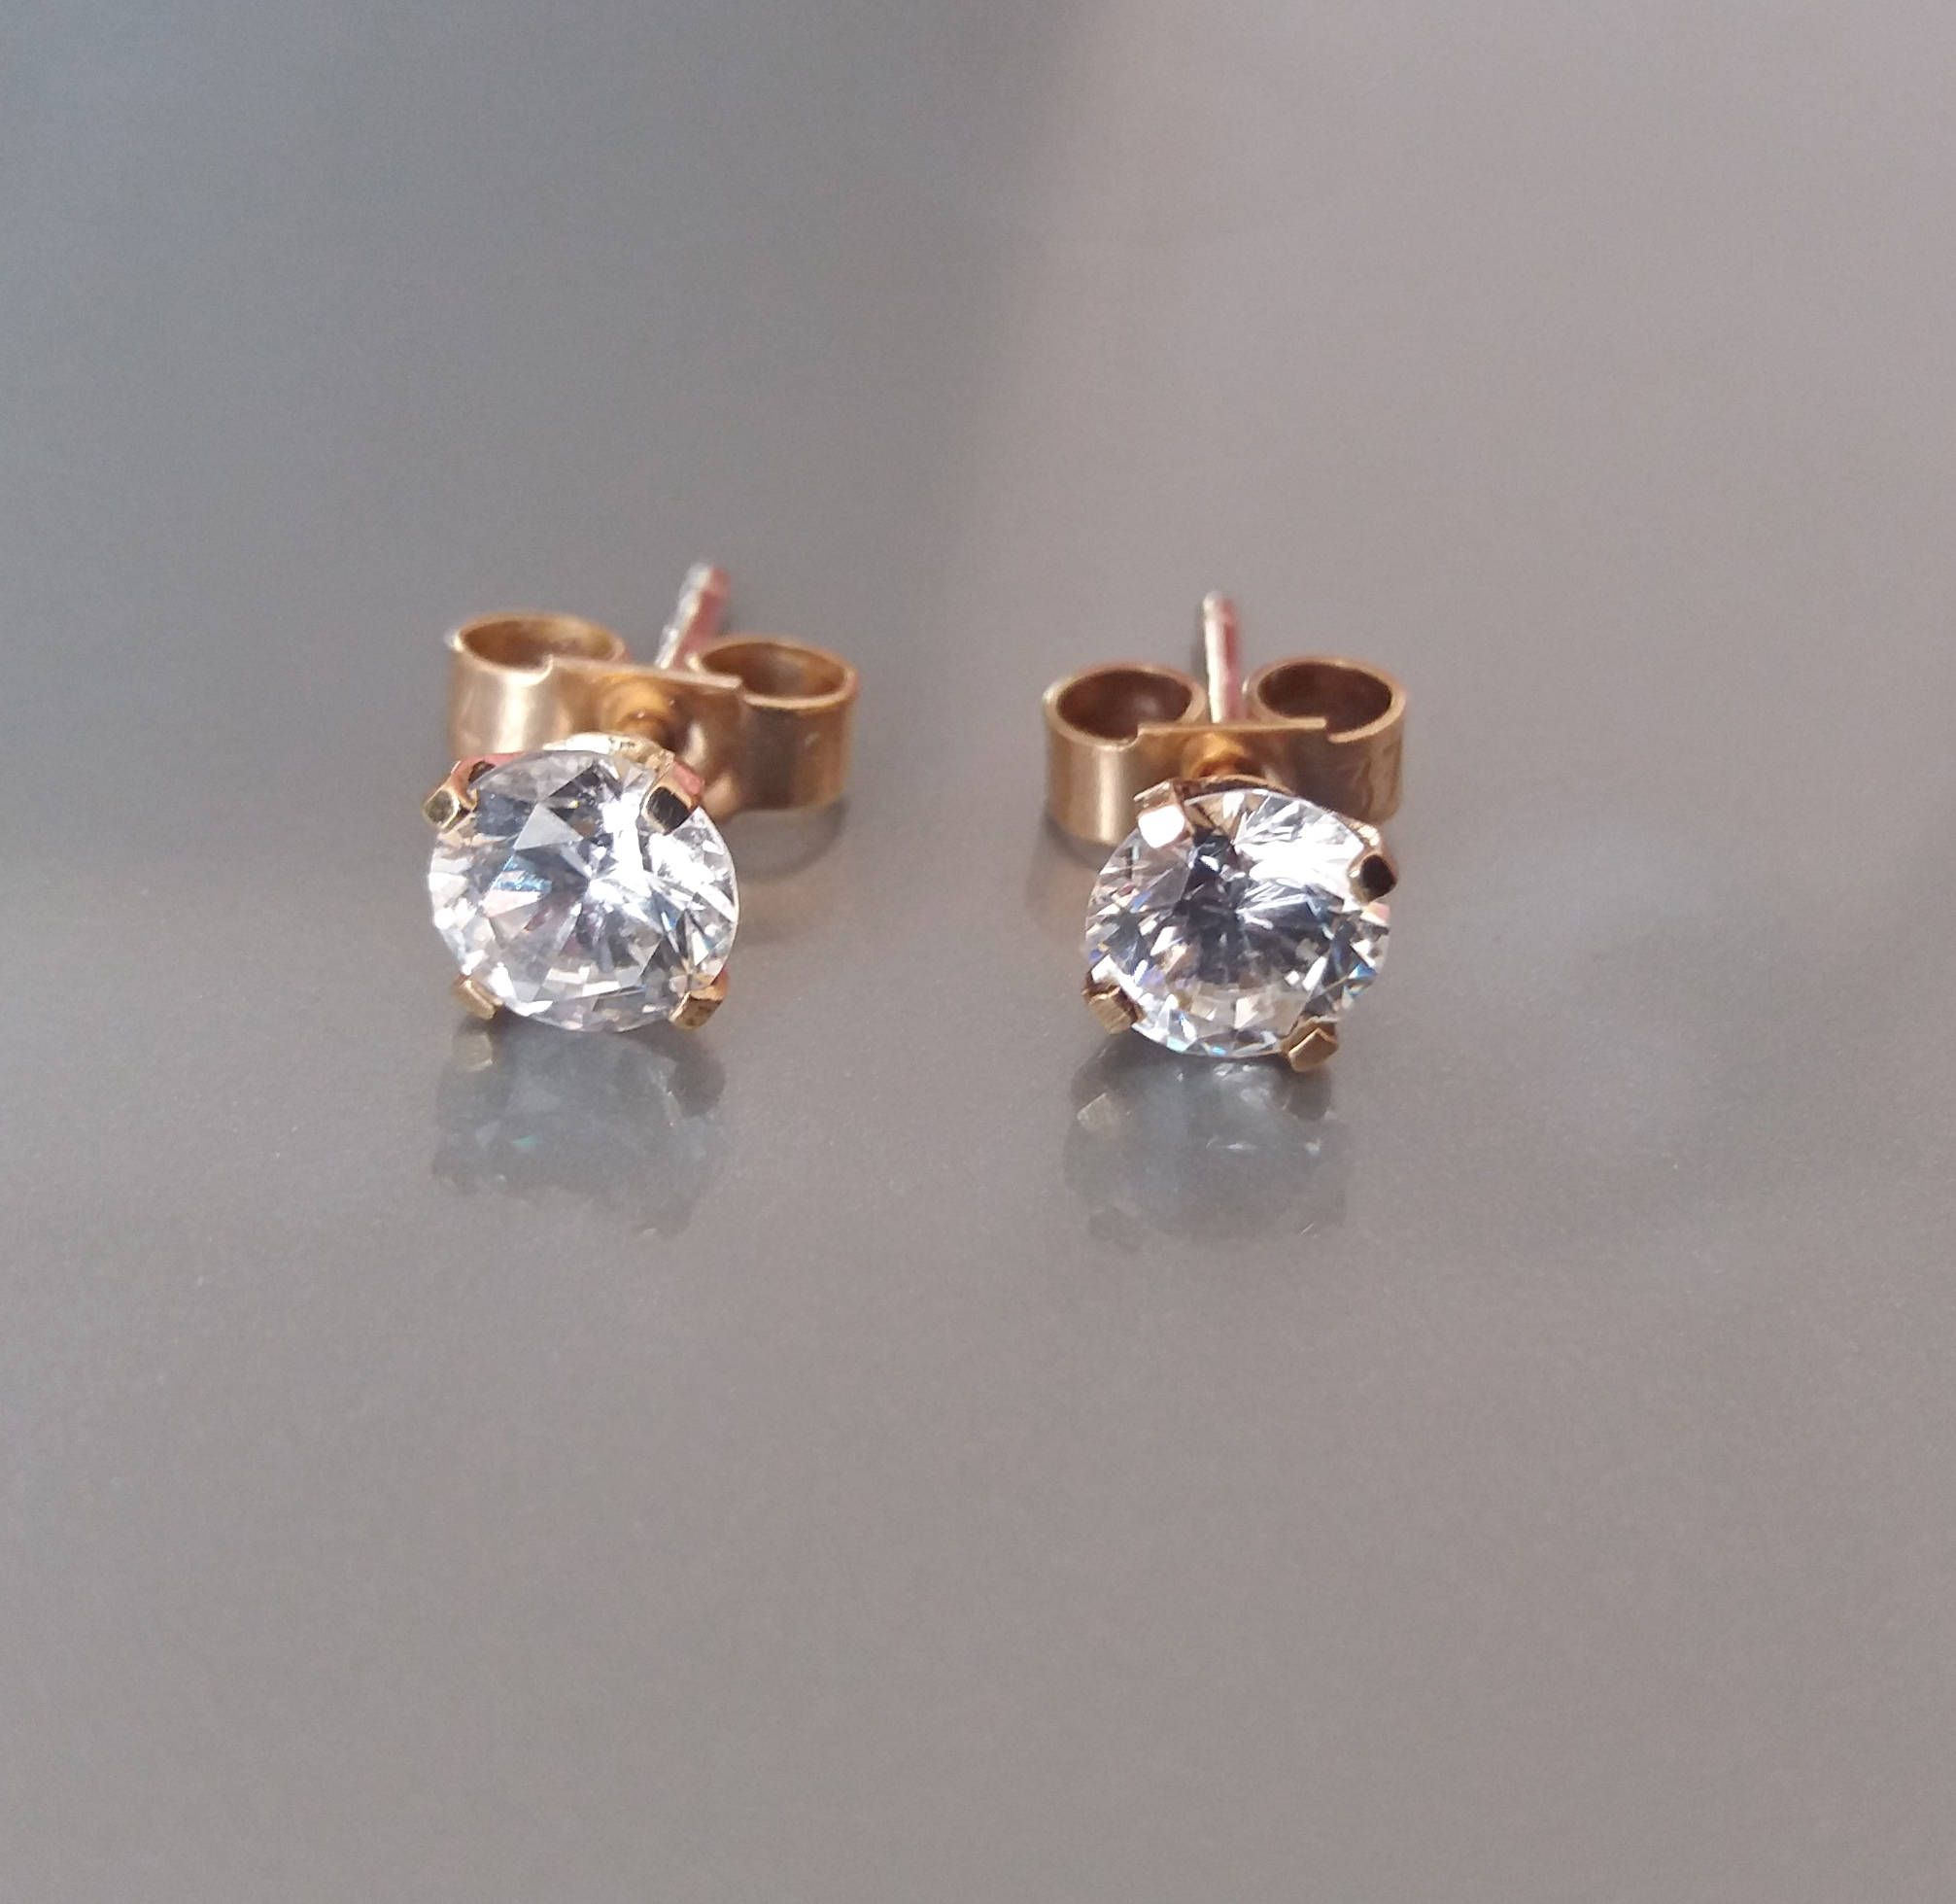 Classic 9ct Gold Stud Earrings made with Diamond Cubic Zirconia aTi3ociXl